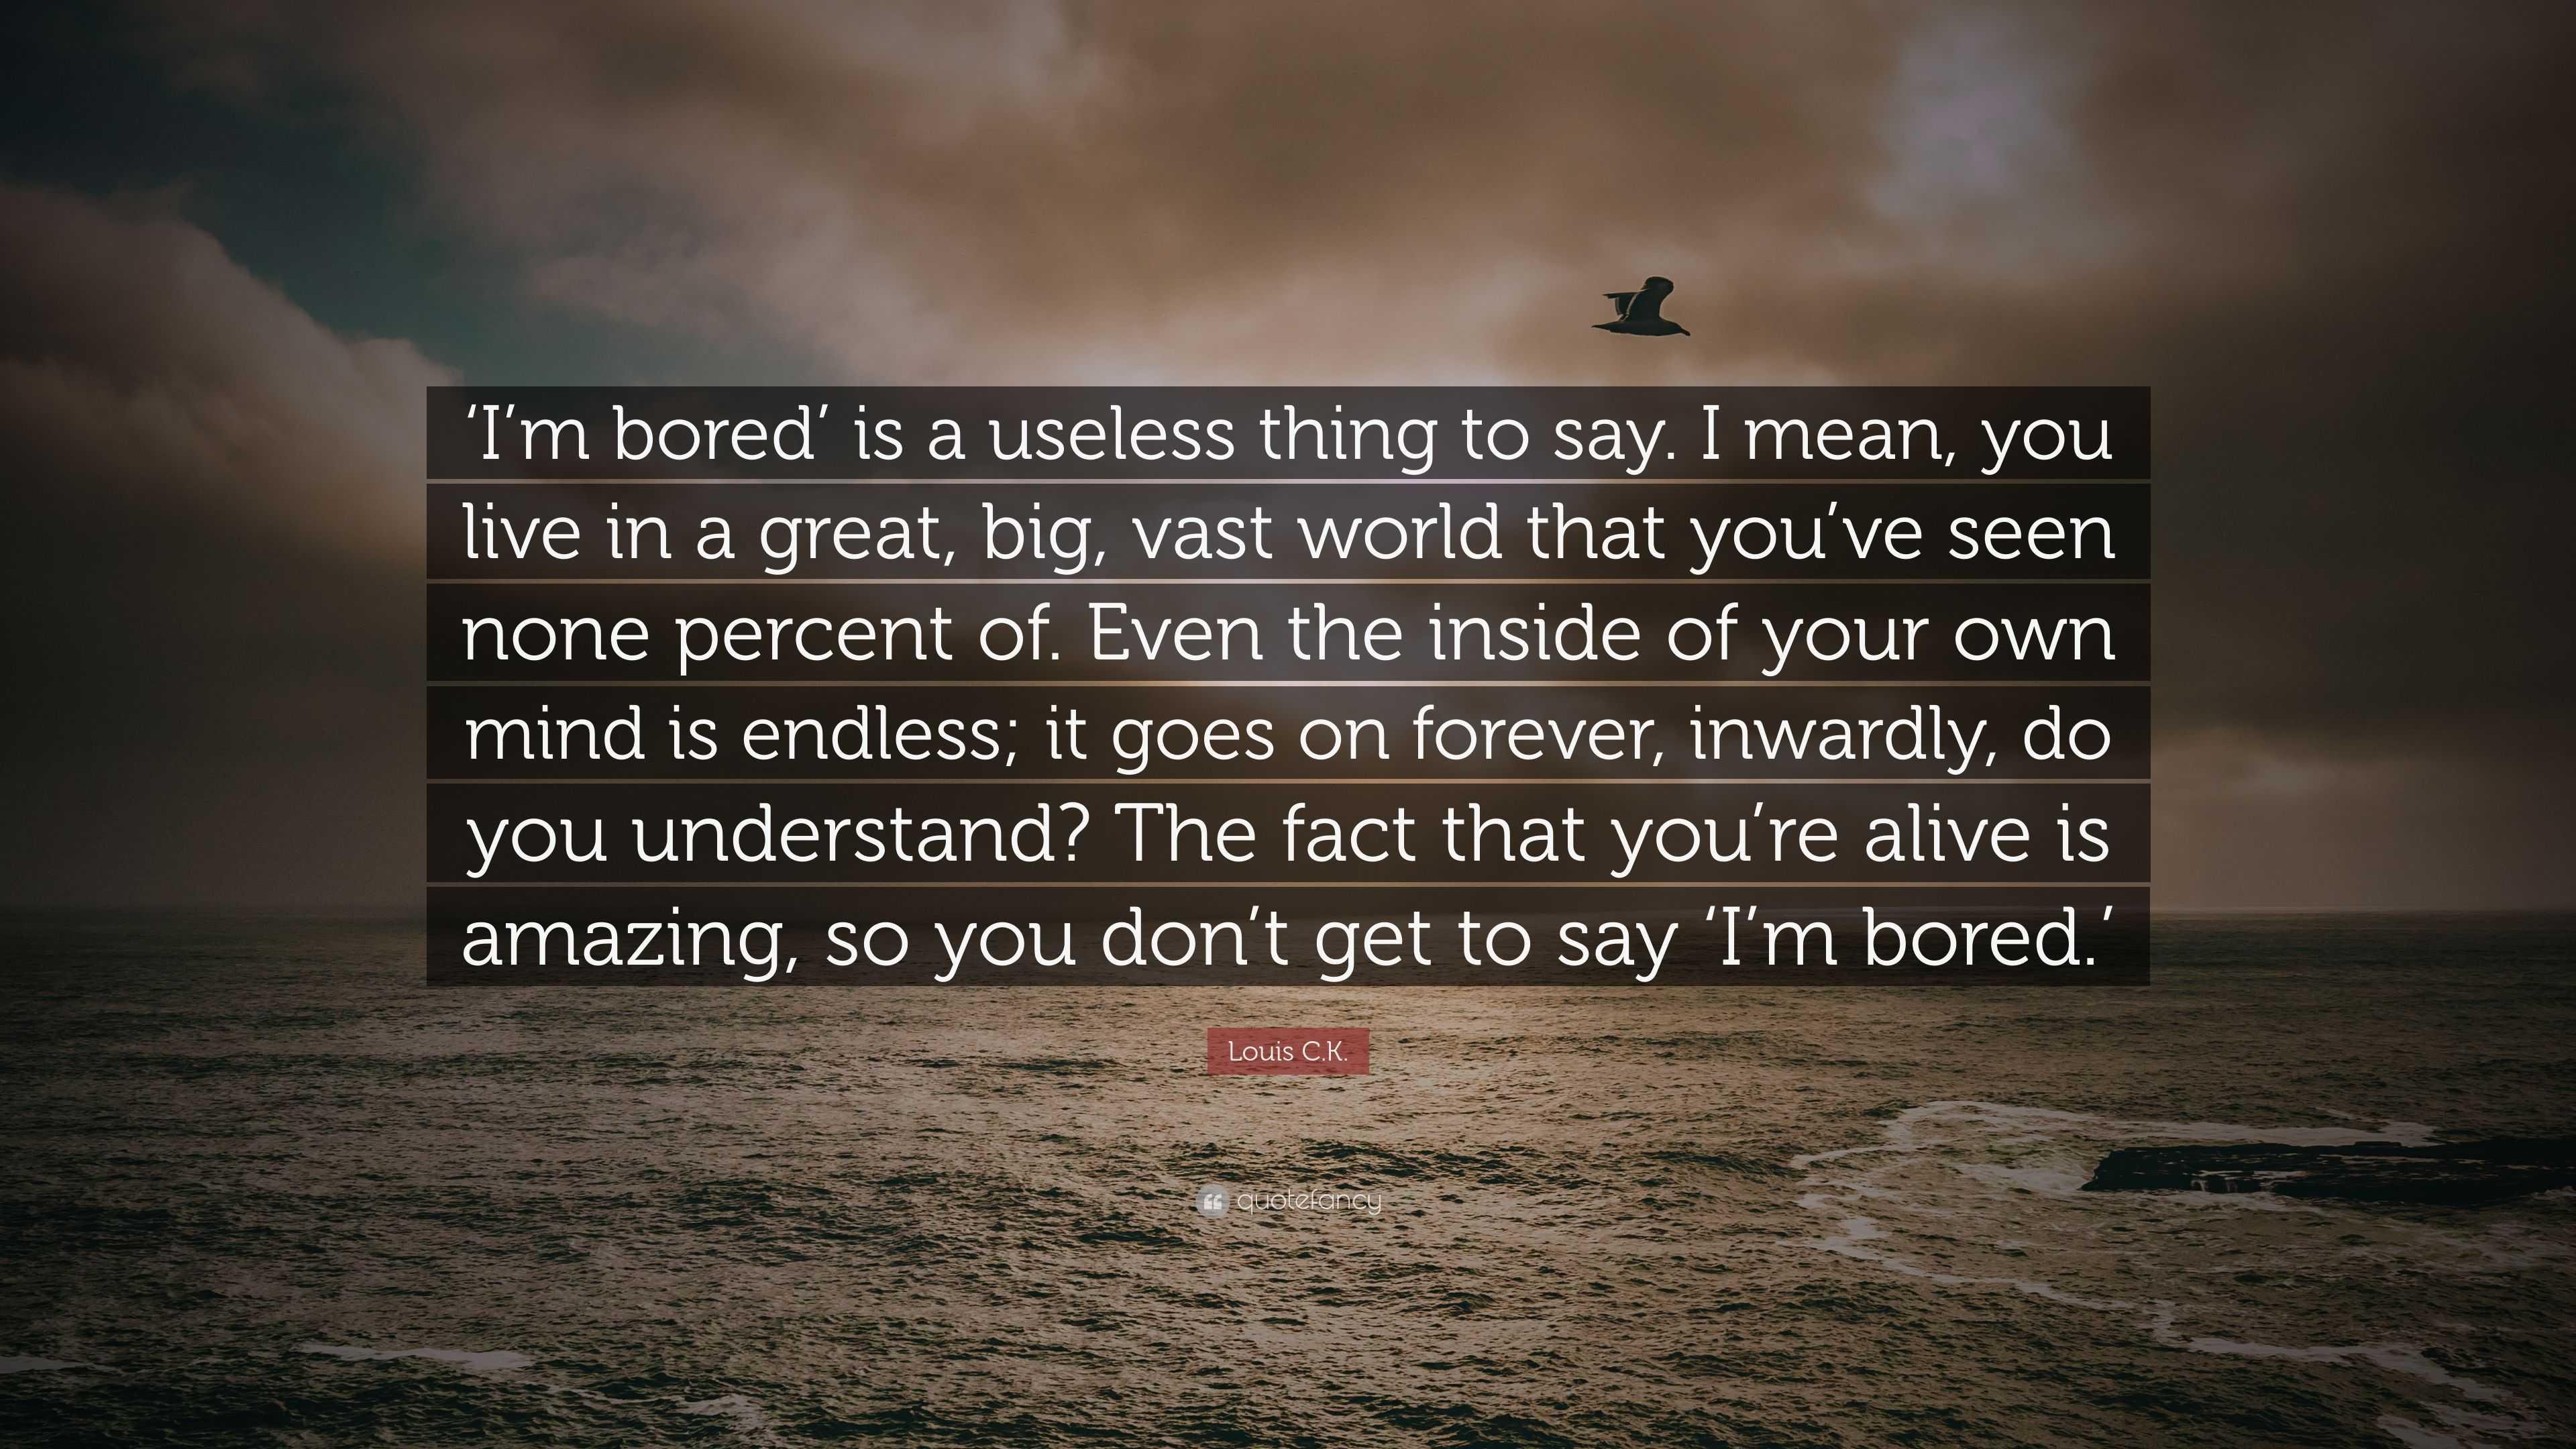 I M Bored Quotes